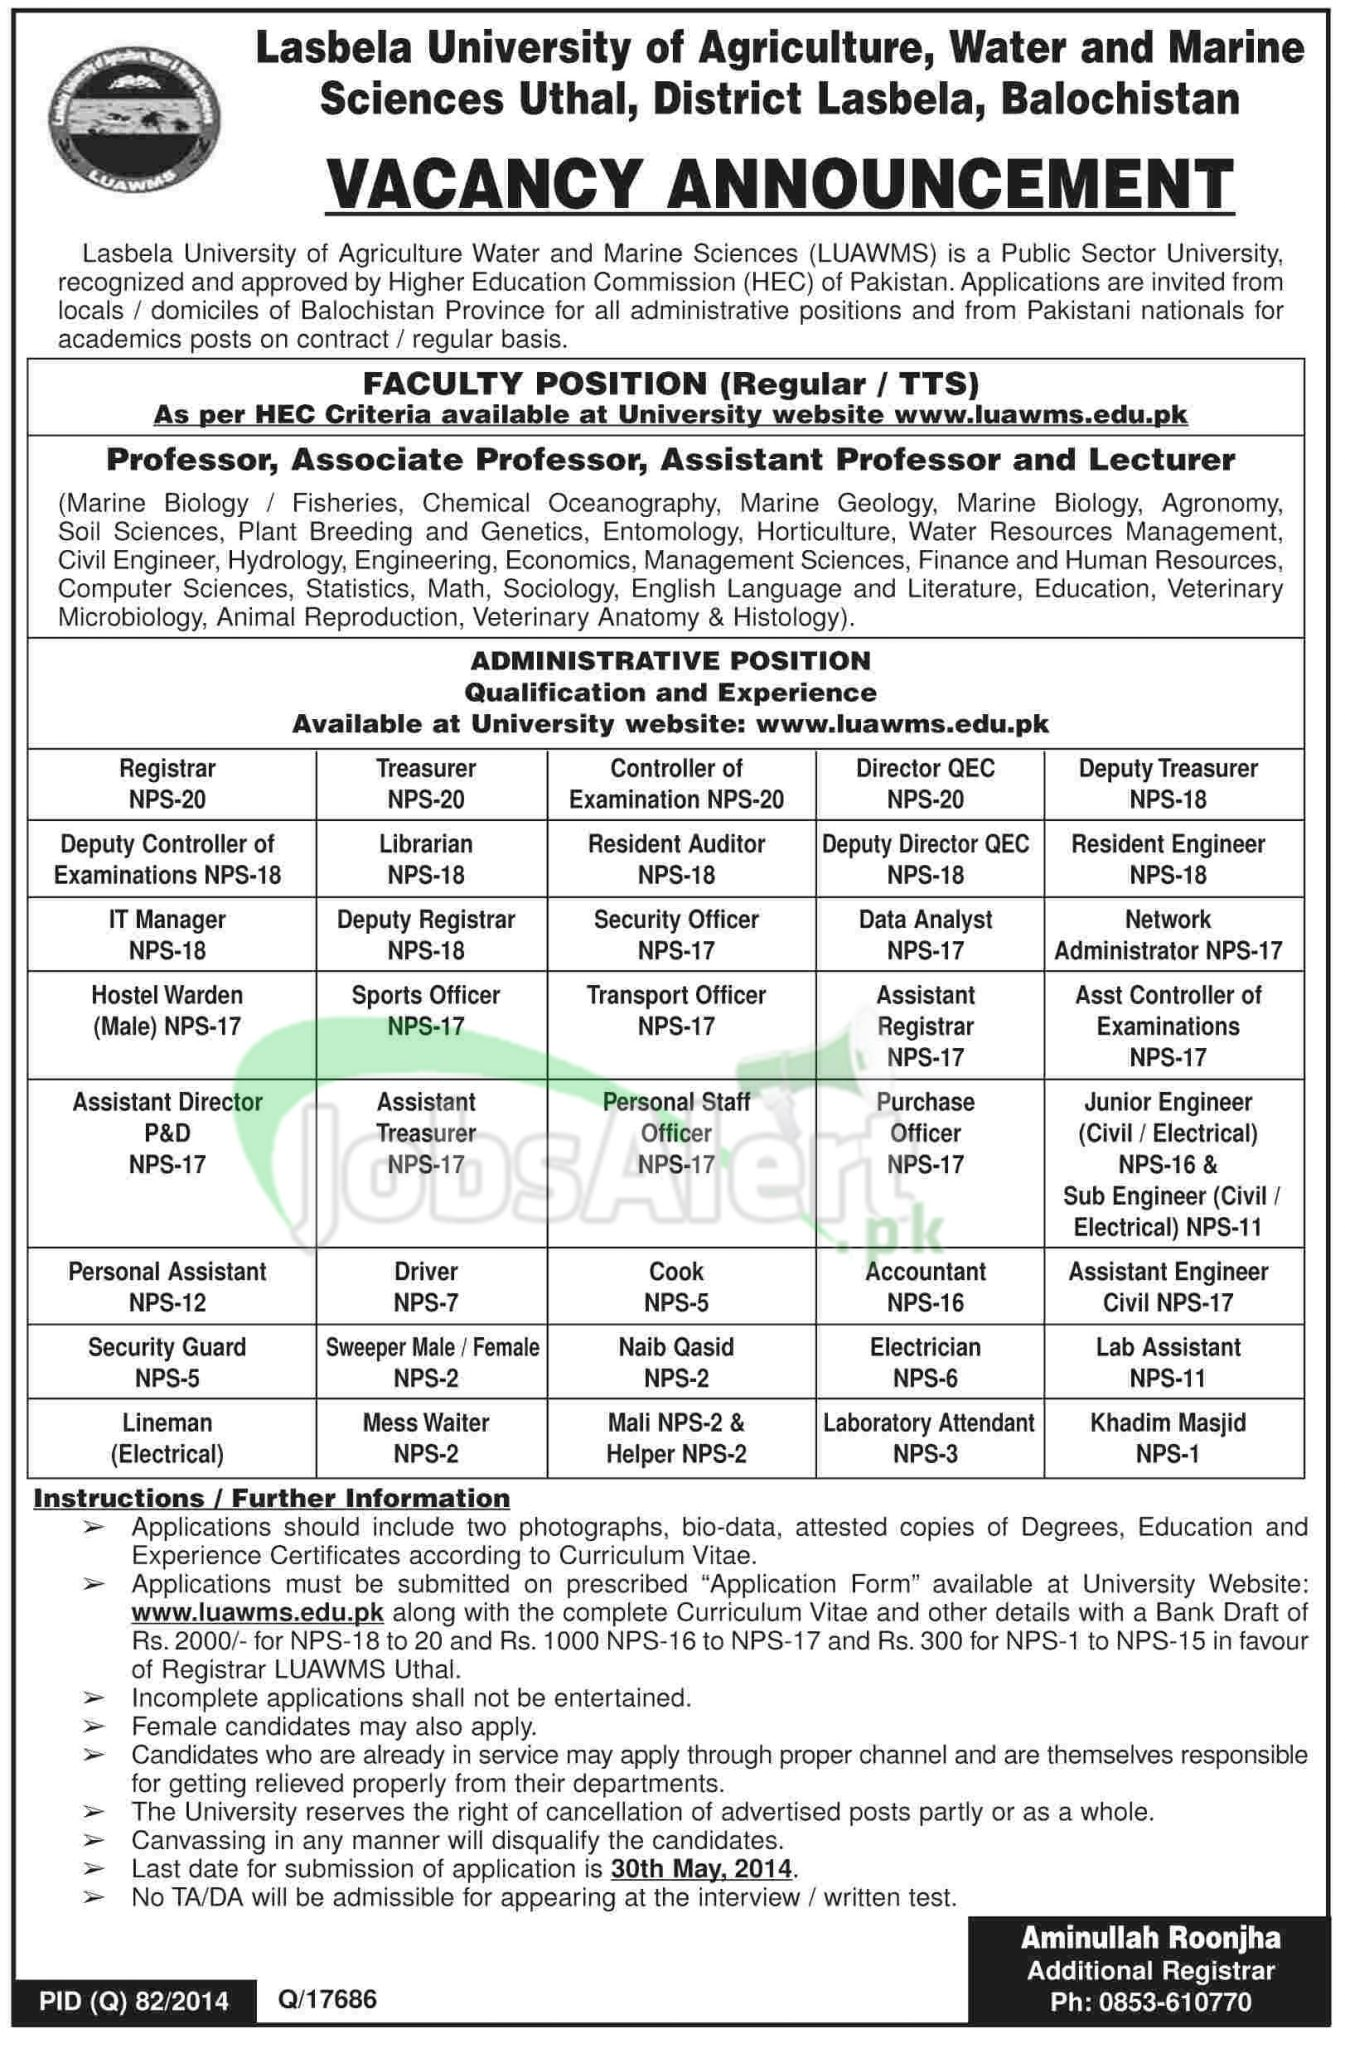 Jobs in Lasbela University of Agriculture Water & Marine Science